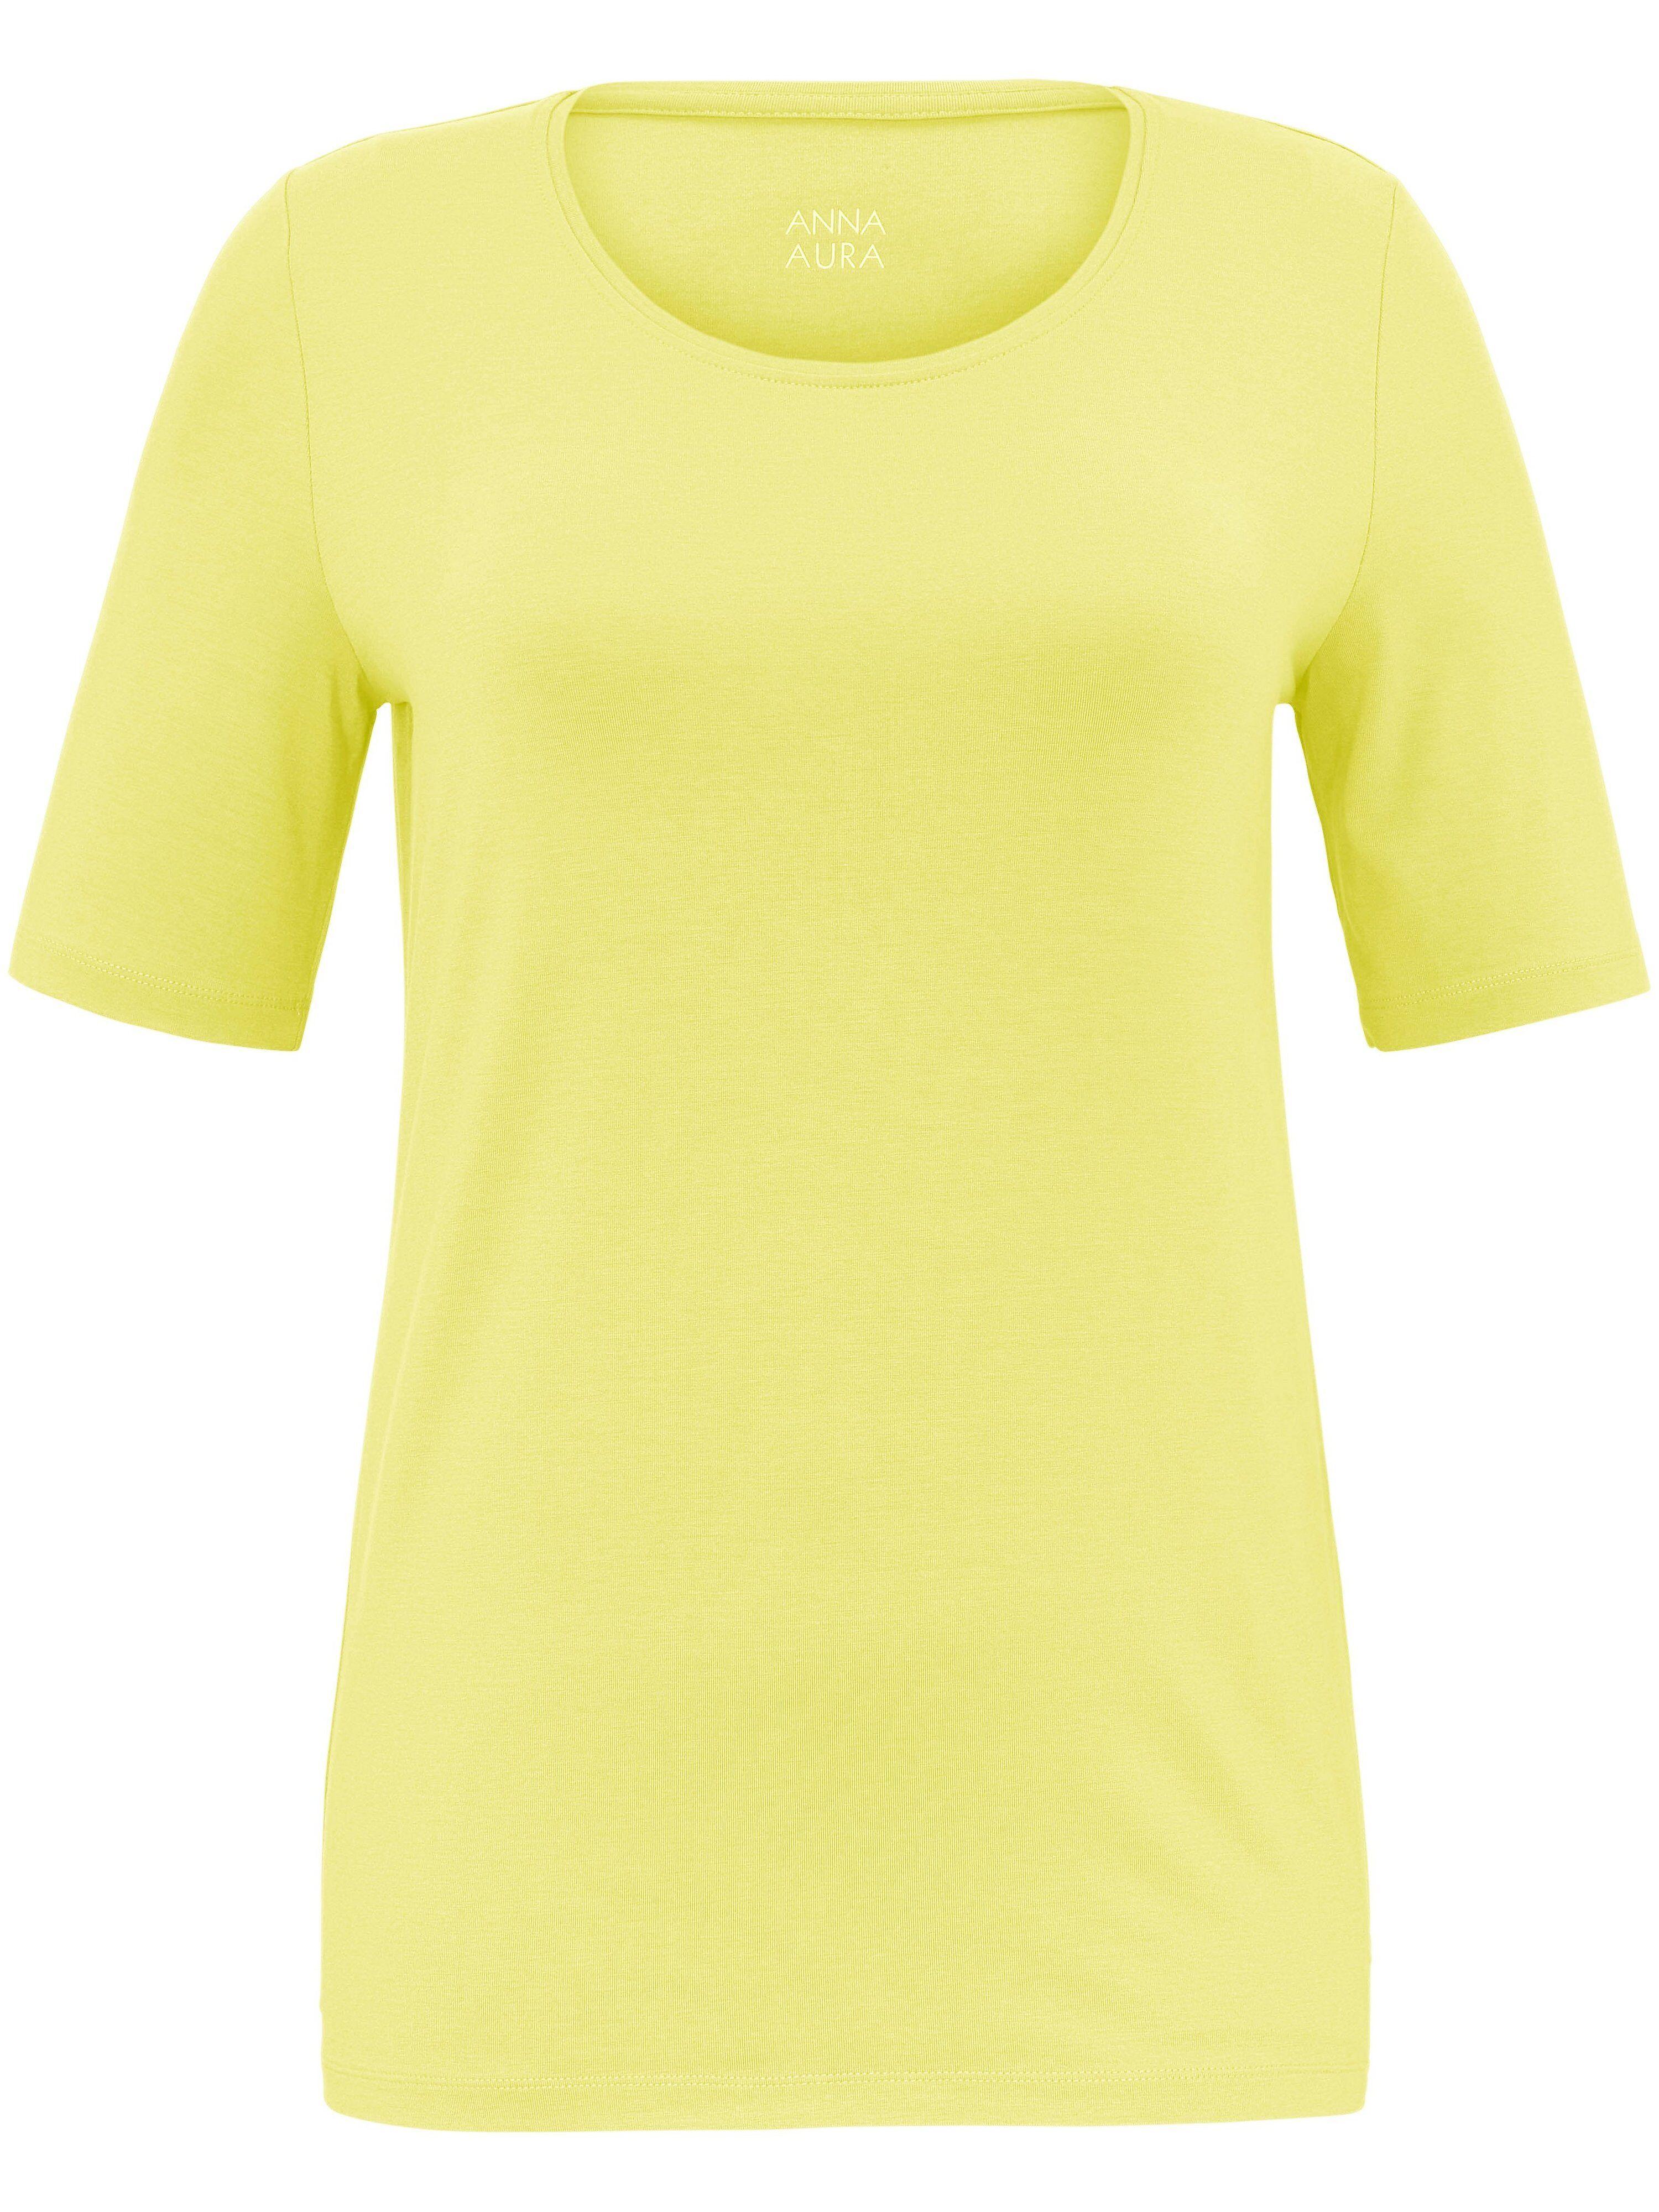 Anna Aura Le T-shirt facile d'entretien  Anna Aura jaune  - Femme - 42